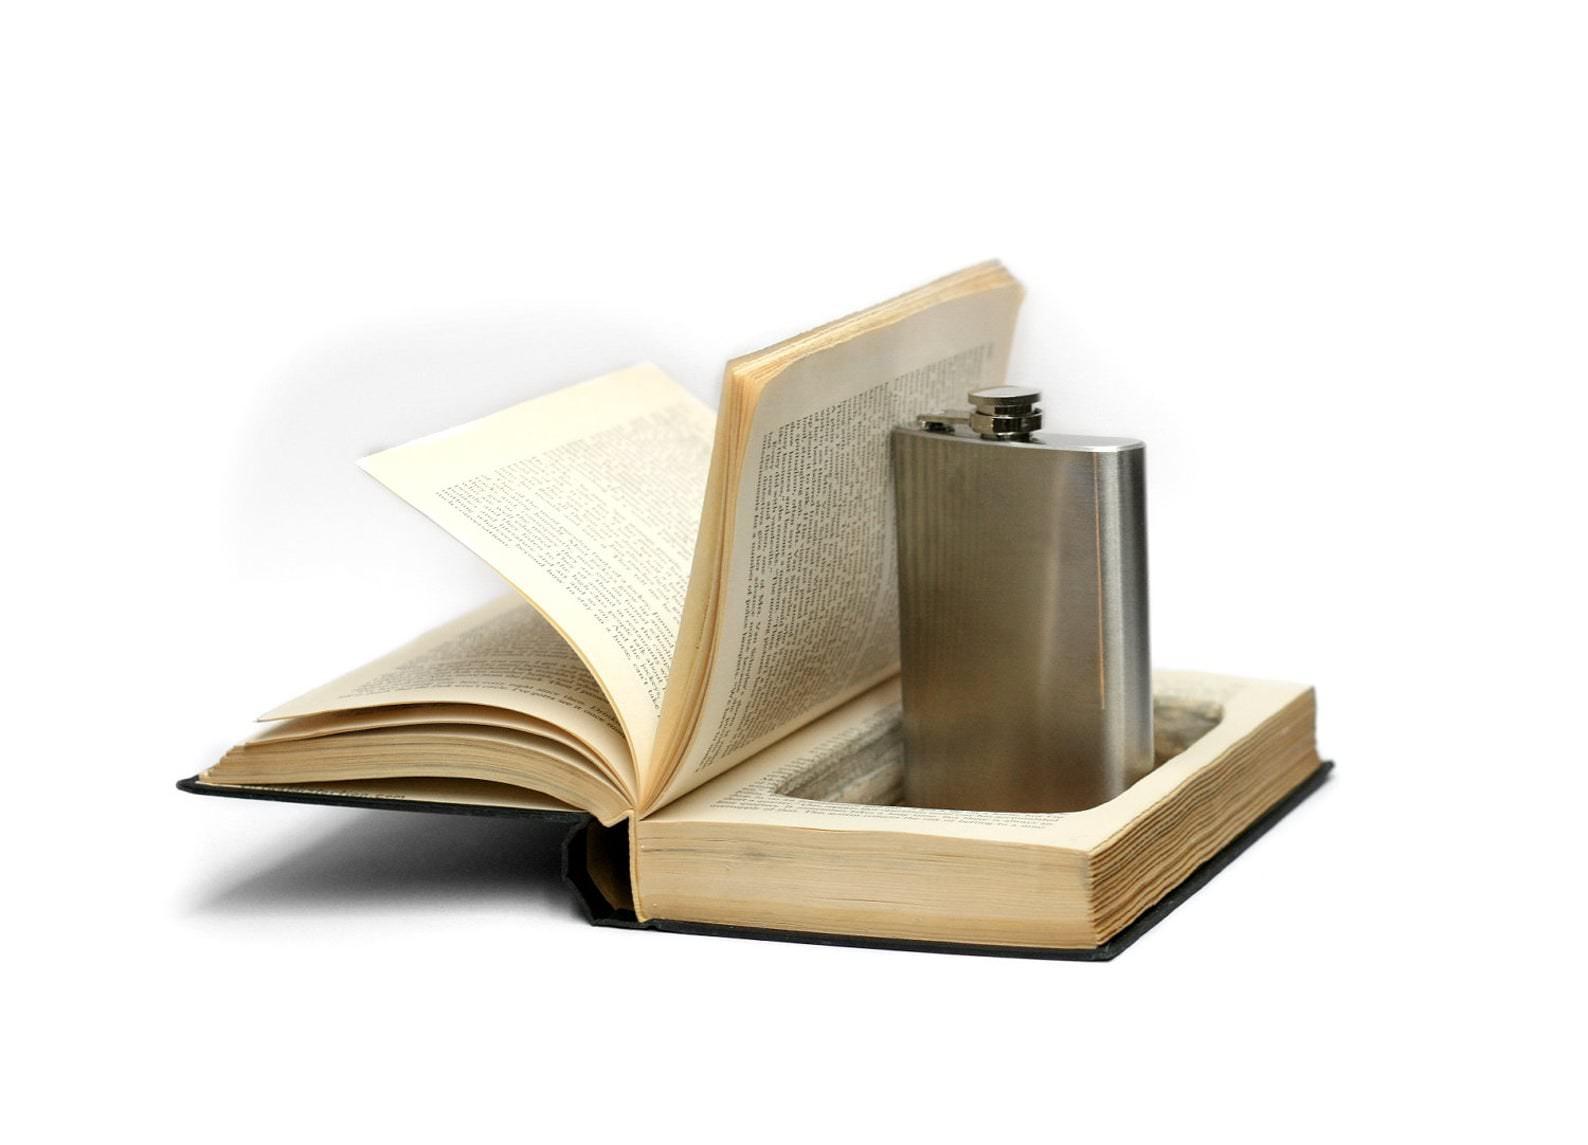 Book With A Hidden Flask